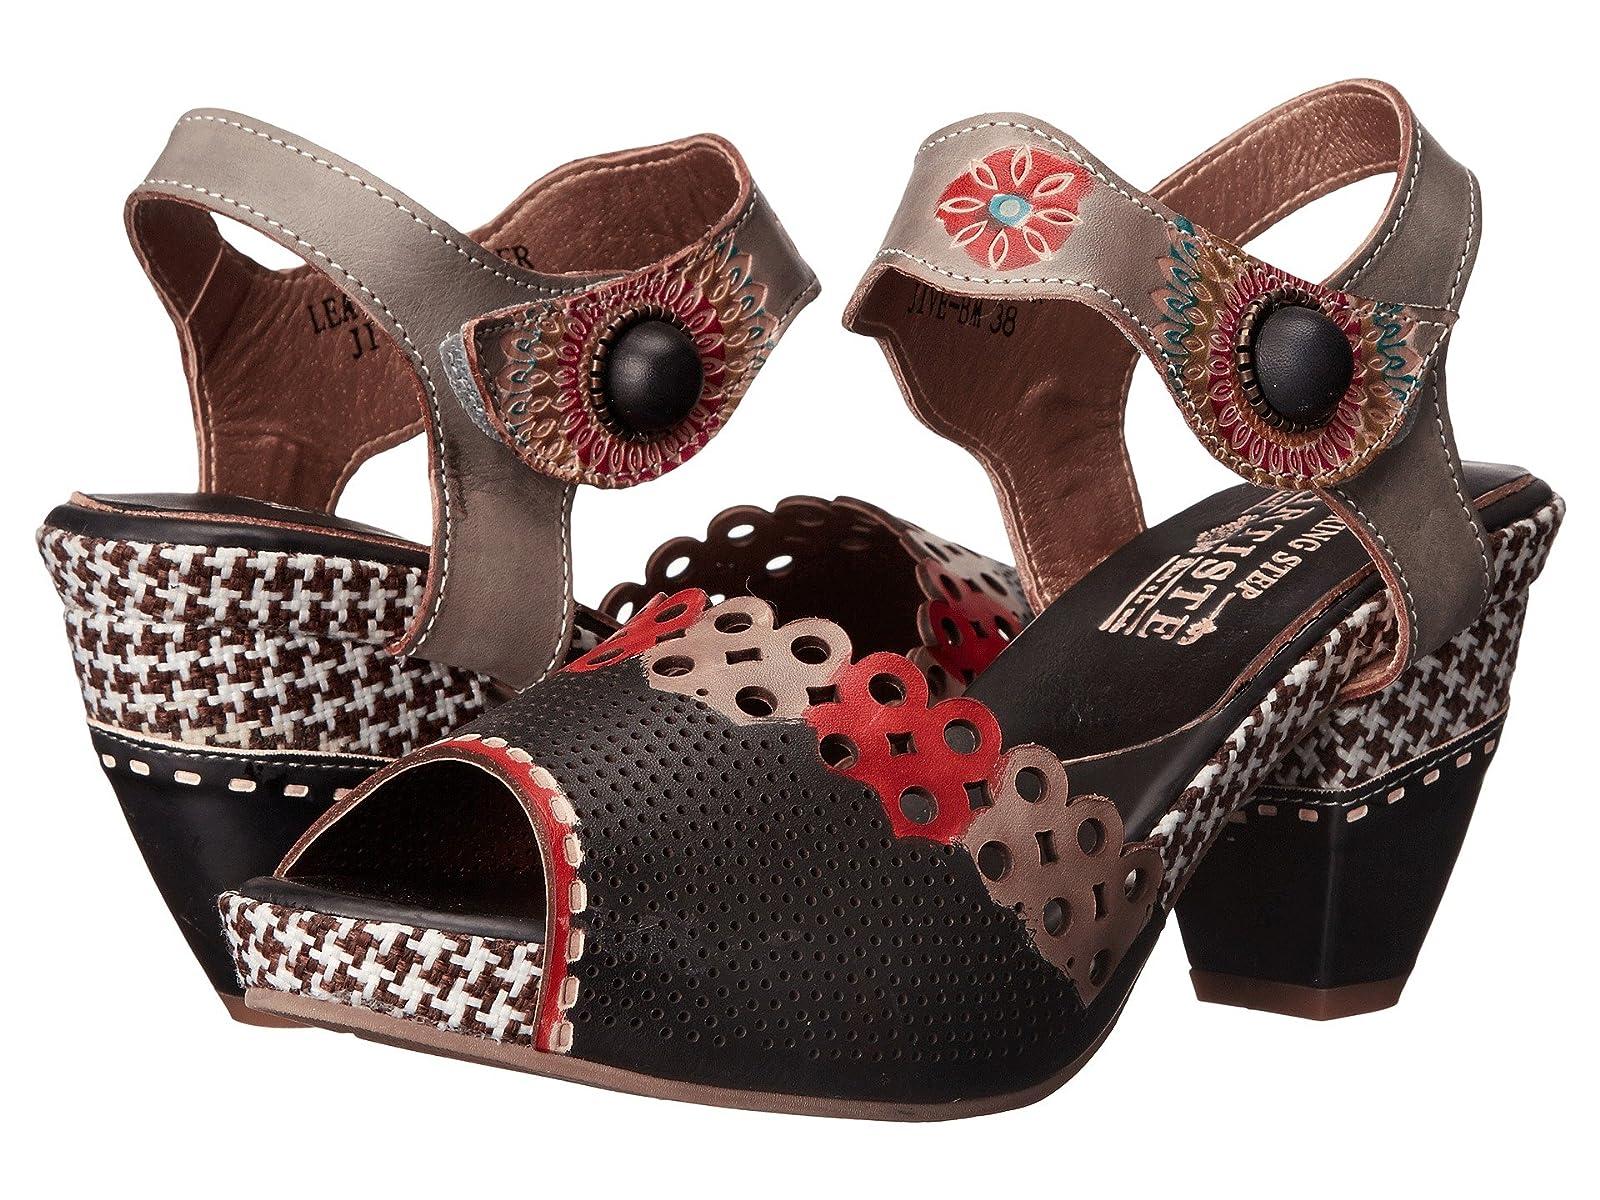 L'Artiste by Spring Step JiveAtmospheric grades have affordable shoes